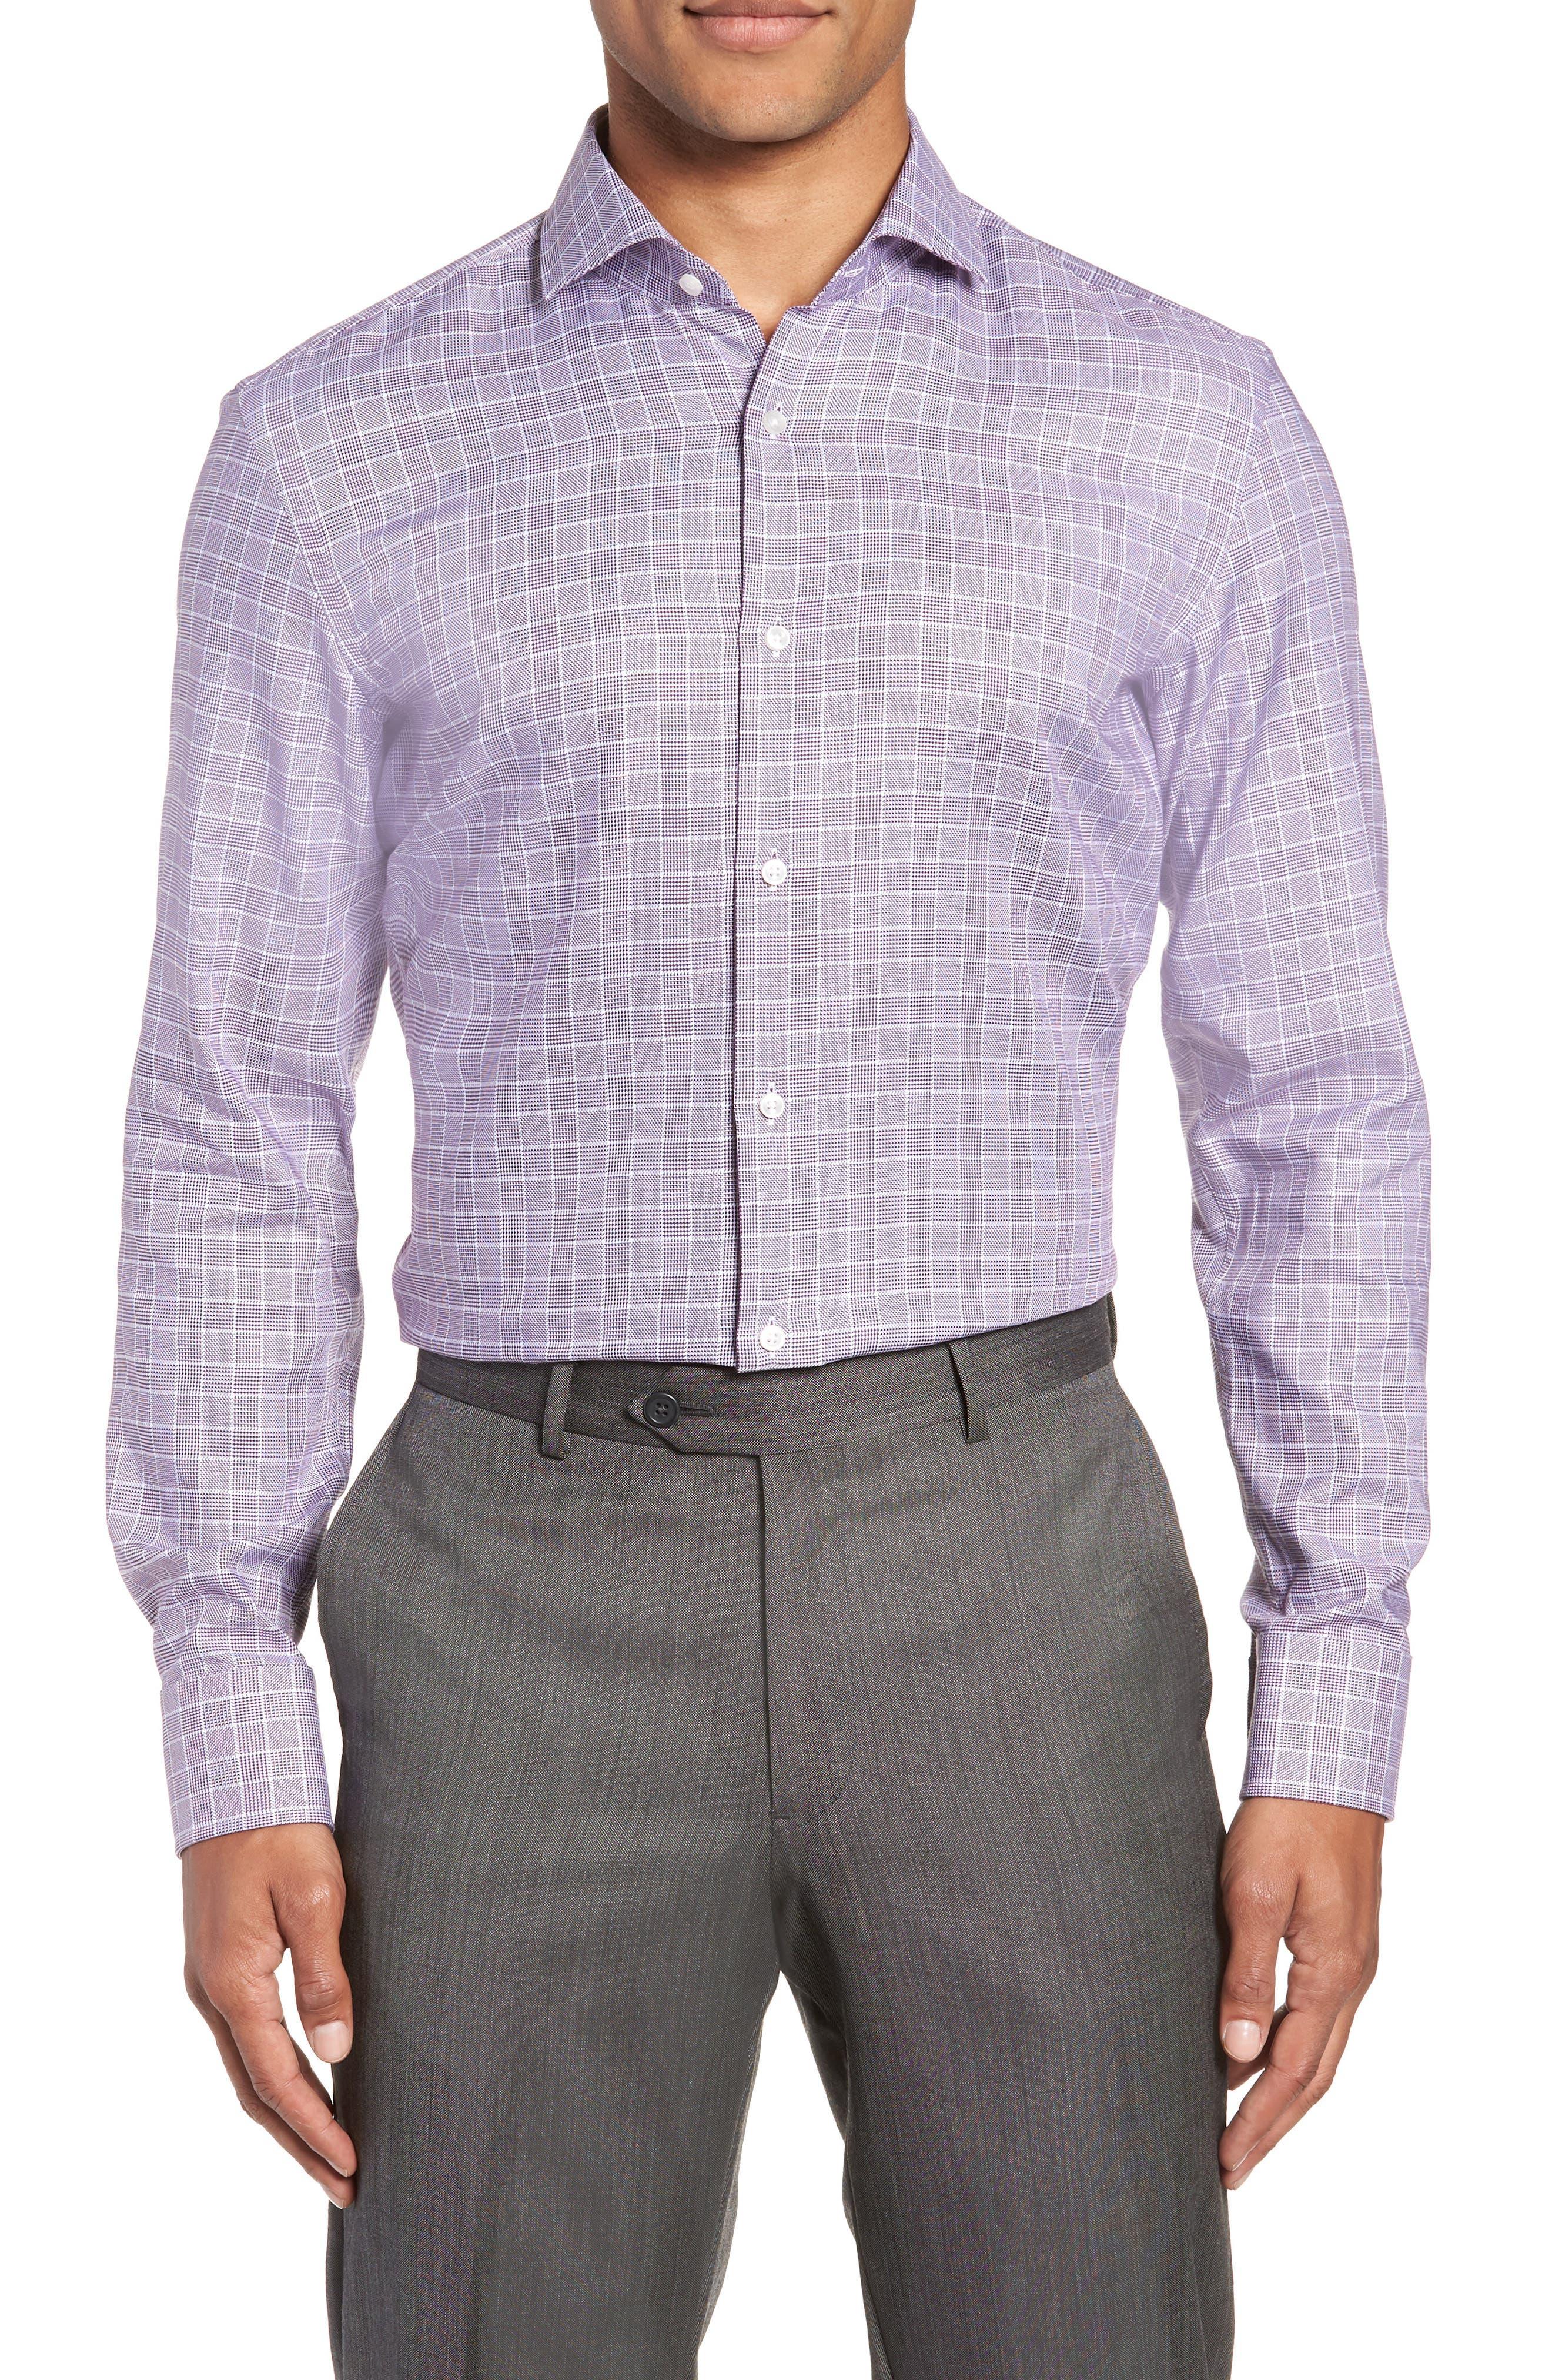 Jason Slim Fit Plaid Dress Shirt,                         Main,                         color, 504 PURPLE